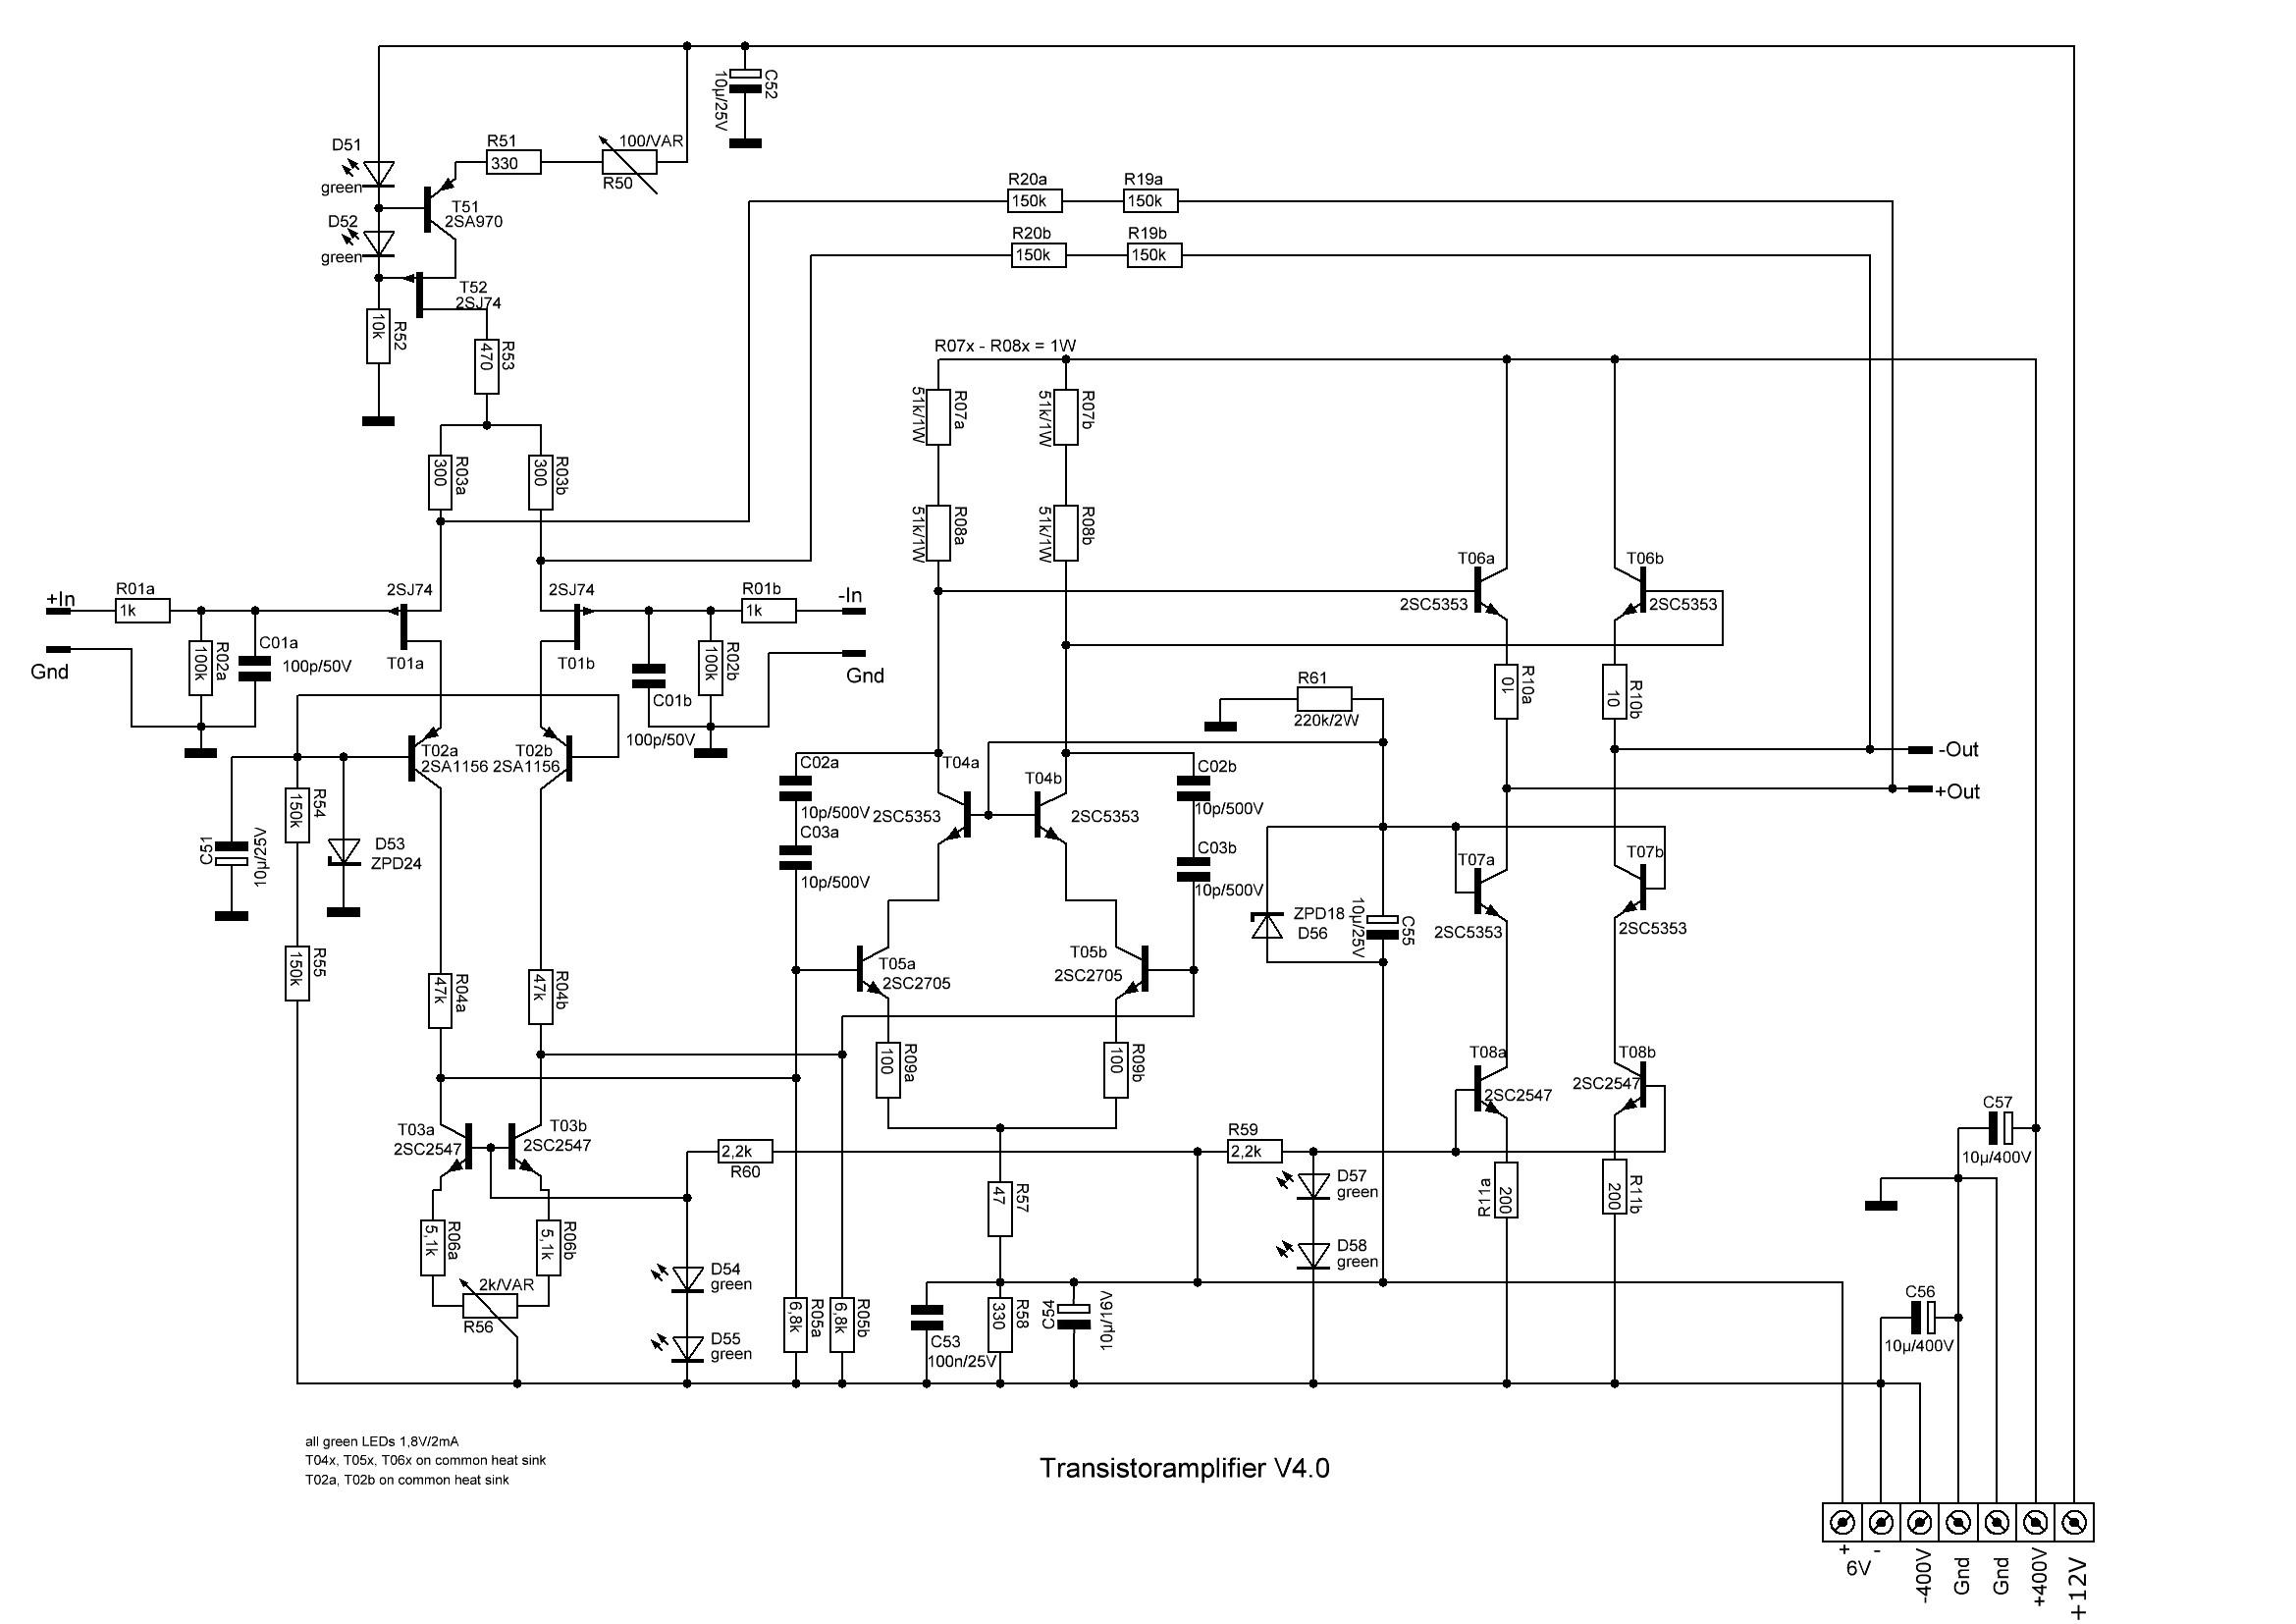 Trans Amp V4 Schematic